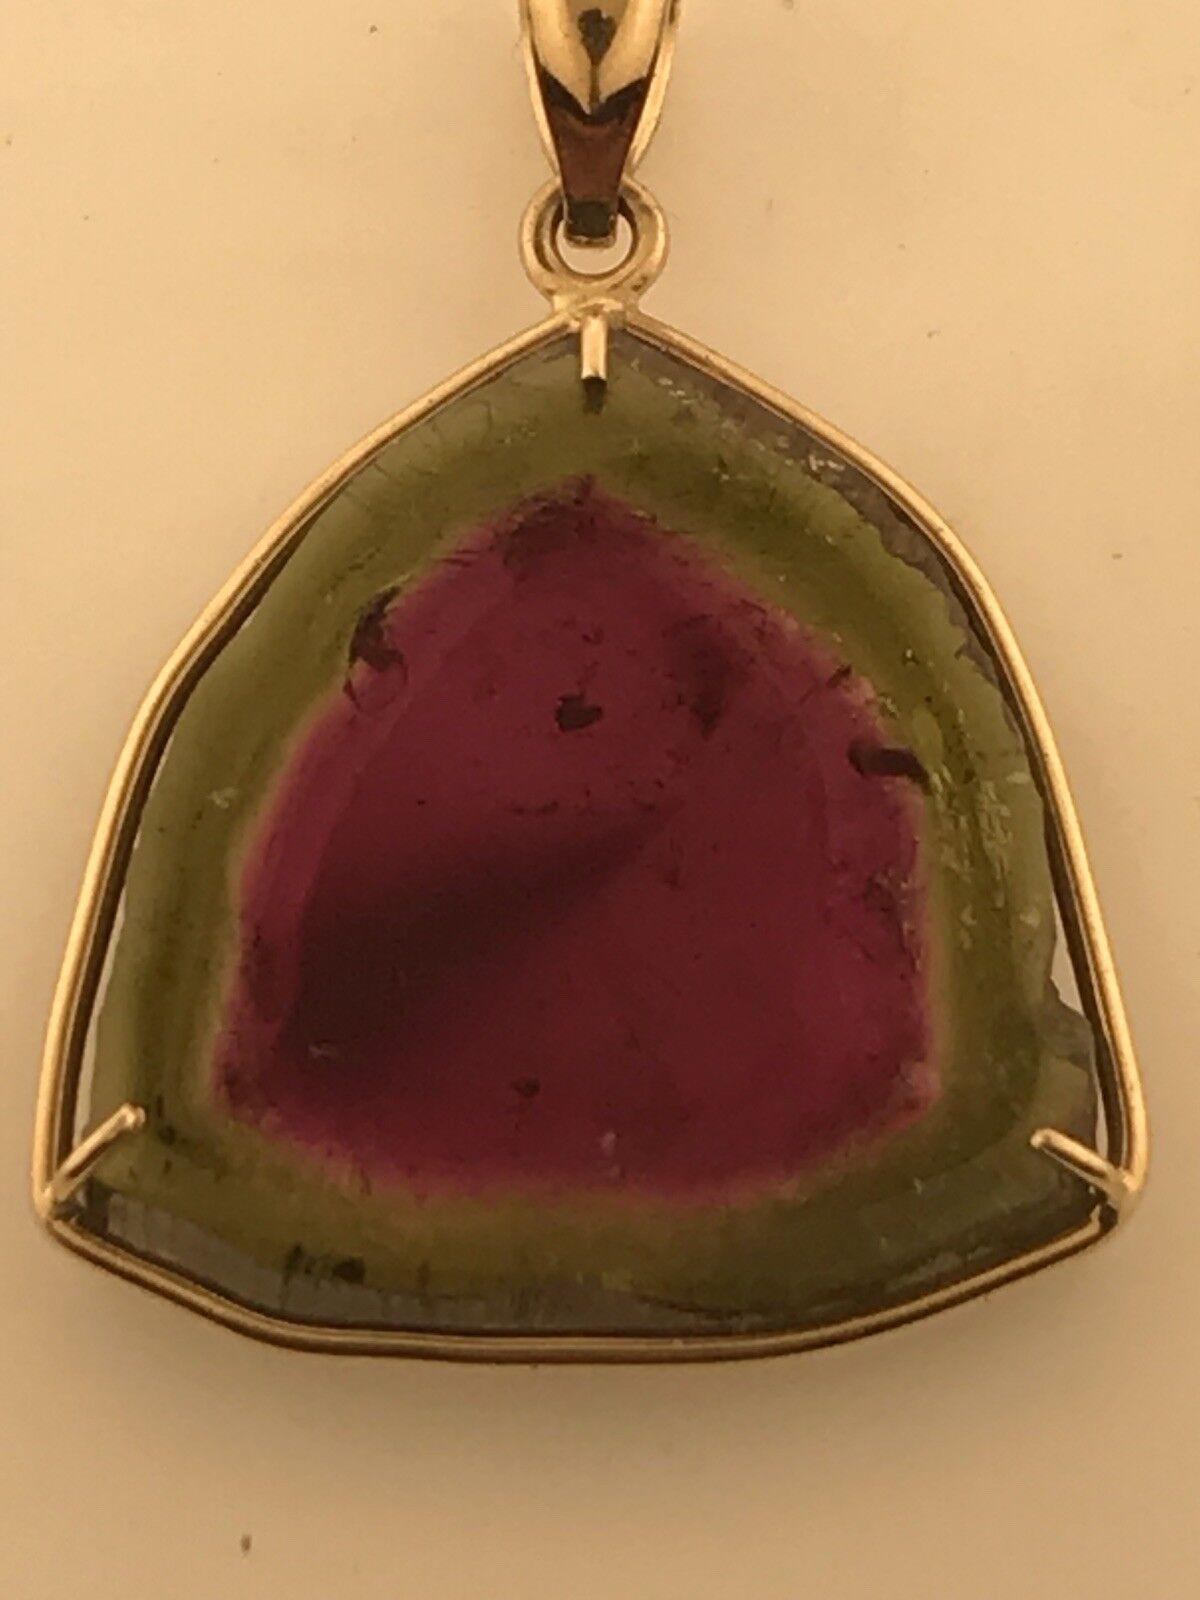 14k Yellow gold 25.26 Ct Watermelon Tourmaline Slice Pendant, 6.1 Grams